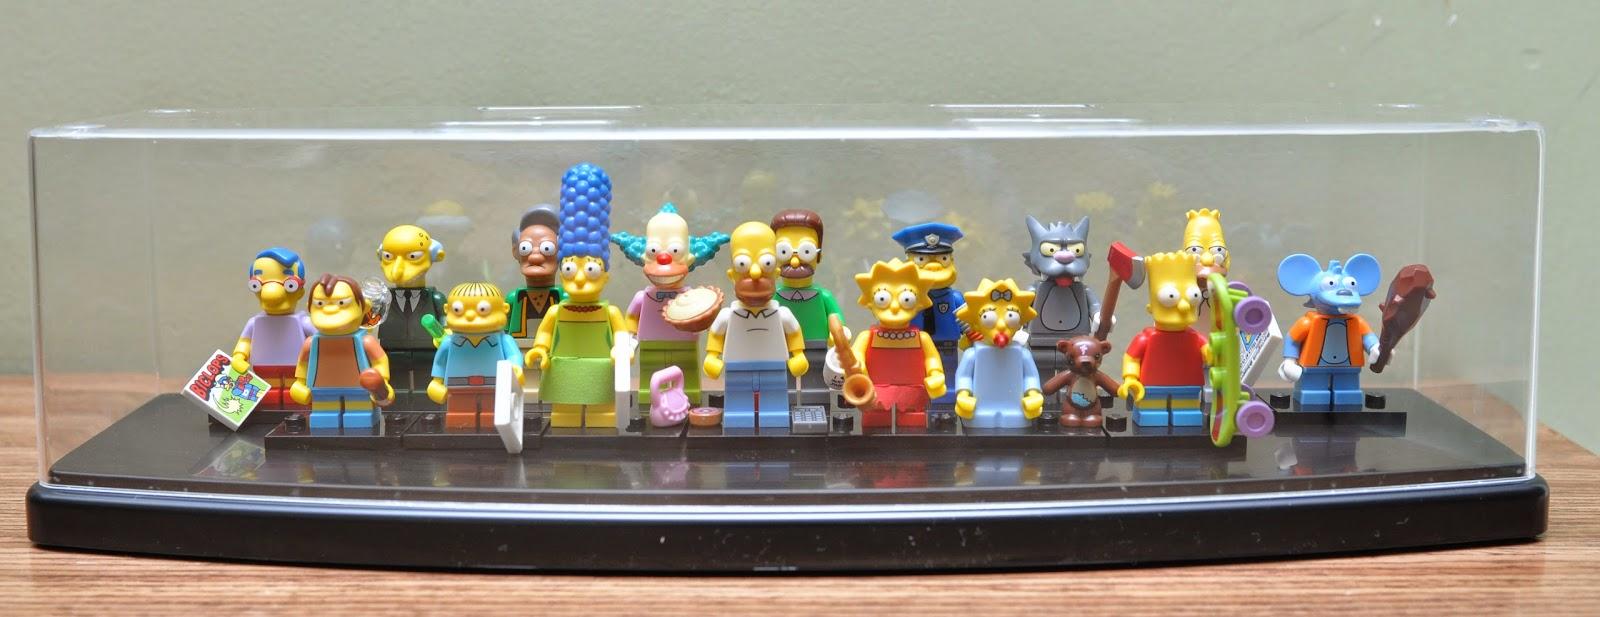 My Brick Store: How i display my Lego Simpsons Minifigure